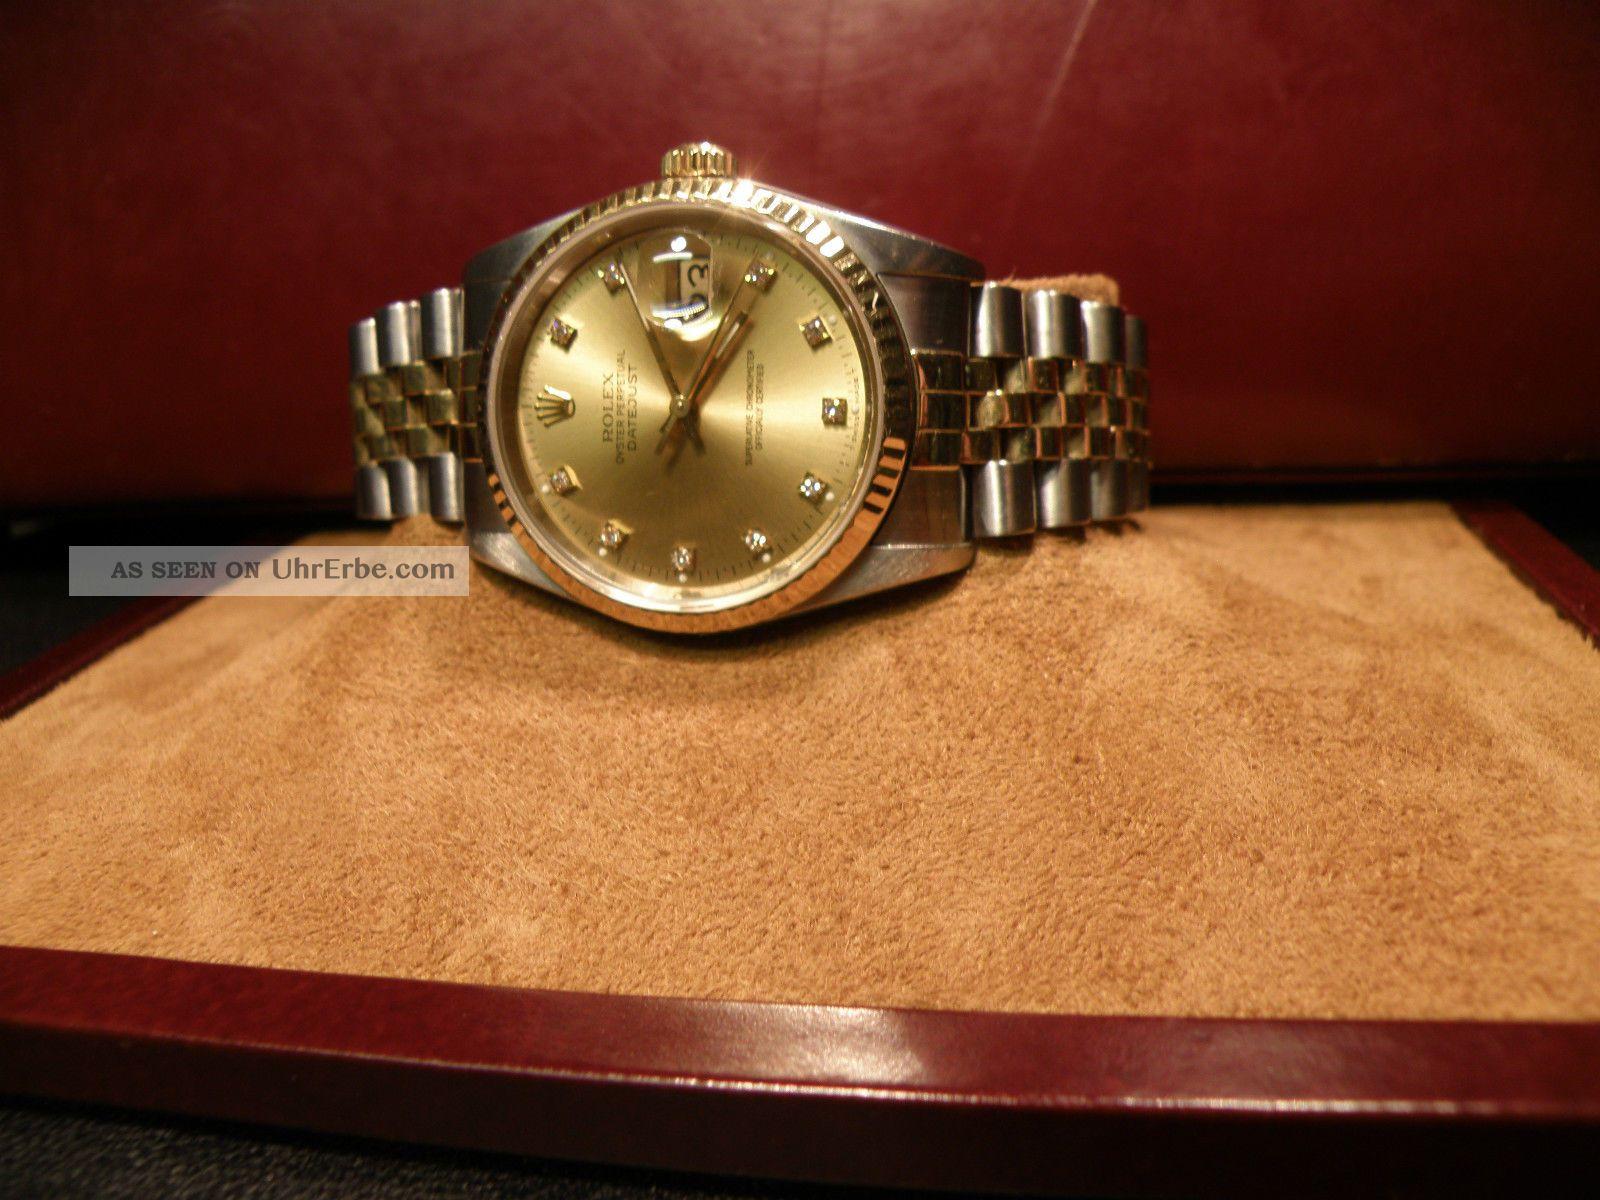 Rolex Oyster Perpetual Automatic Mit Diamantzifferblatt Armbanduhren Bild